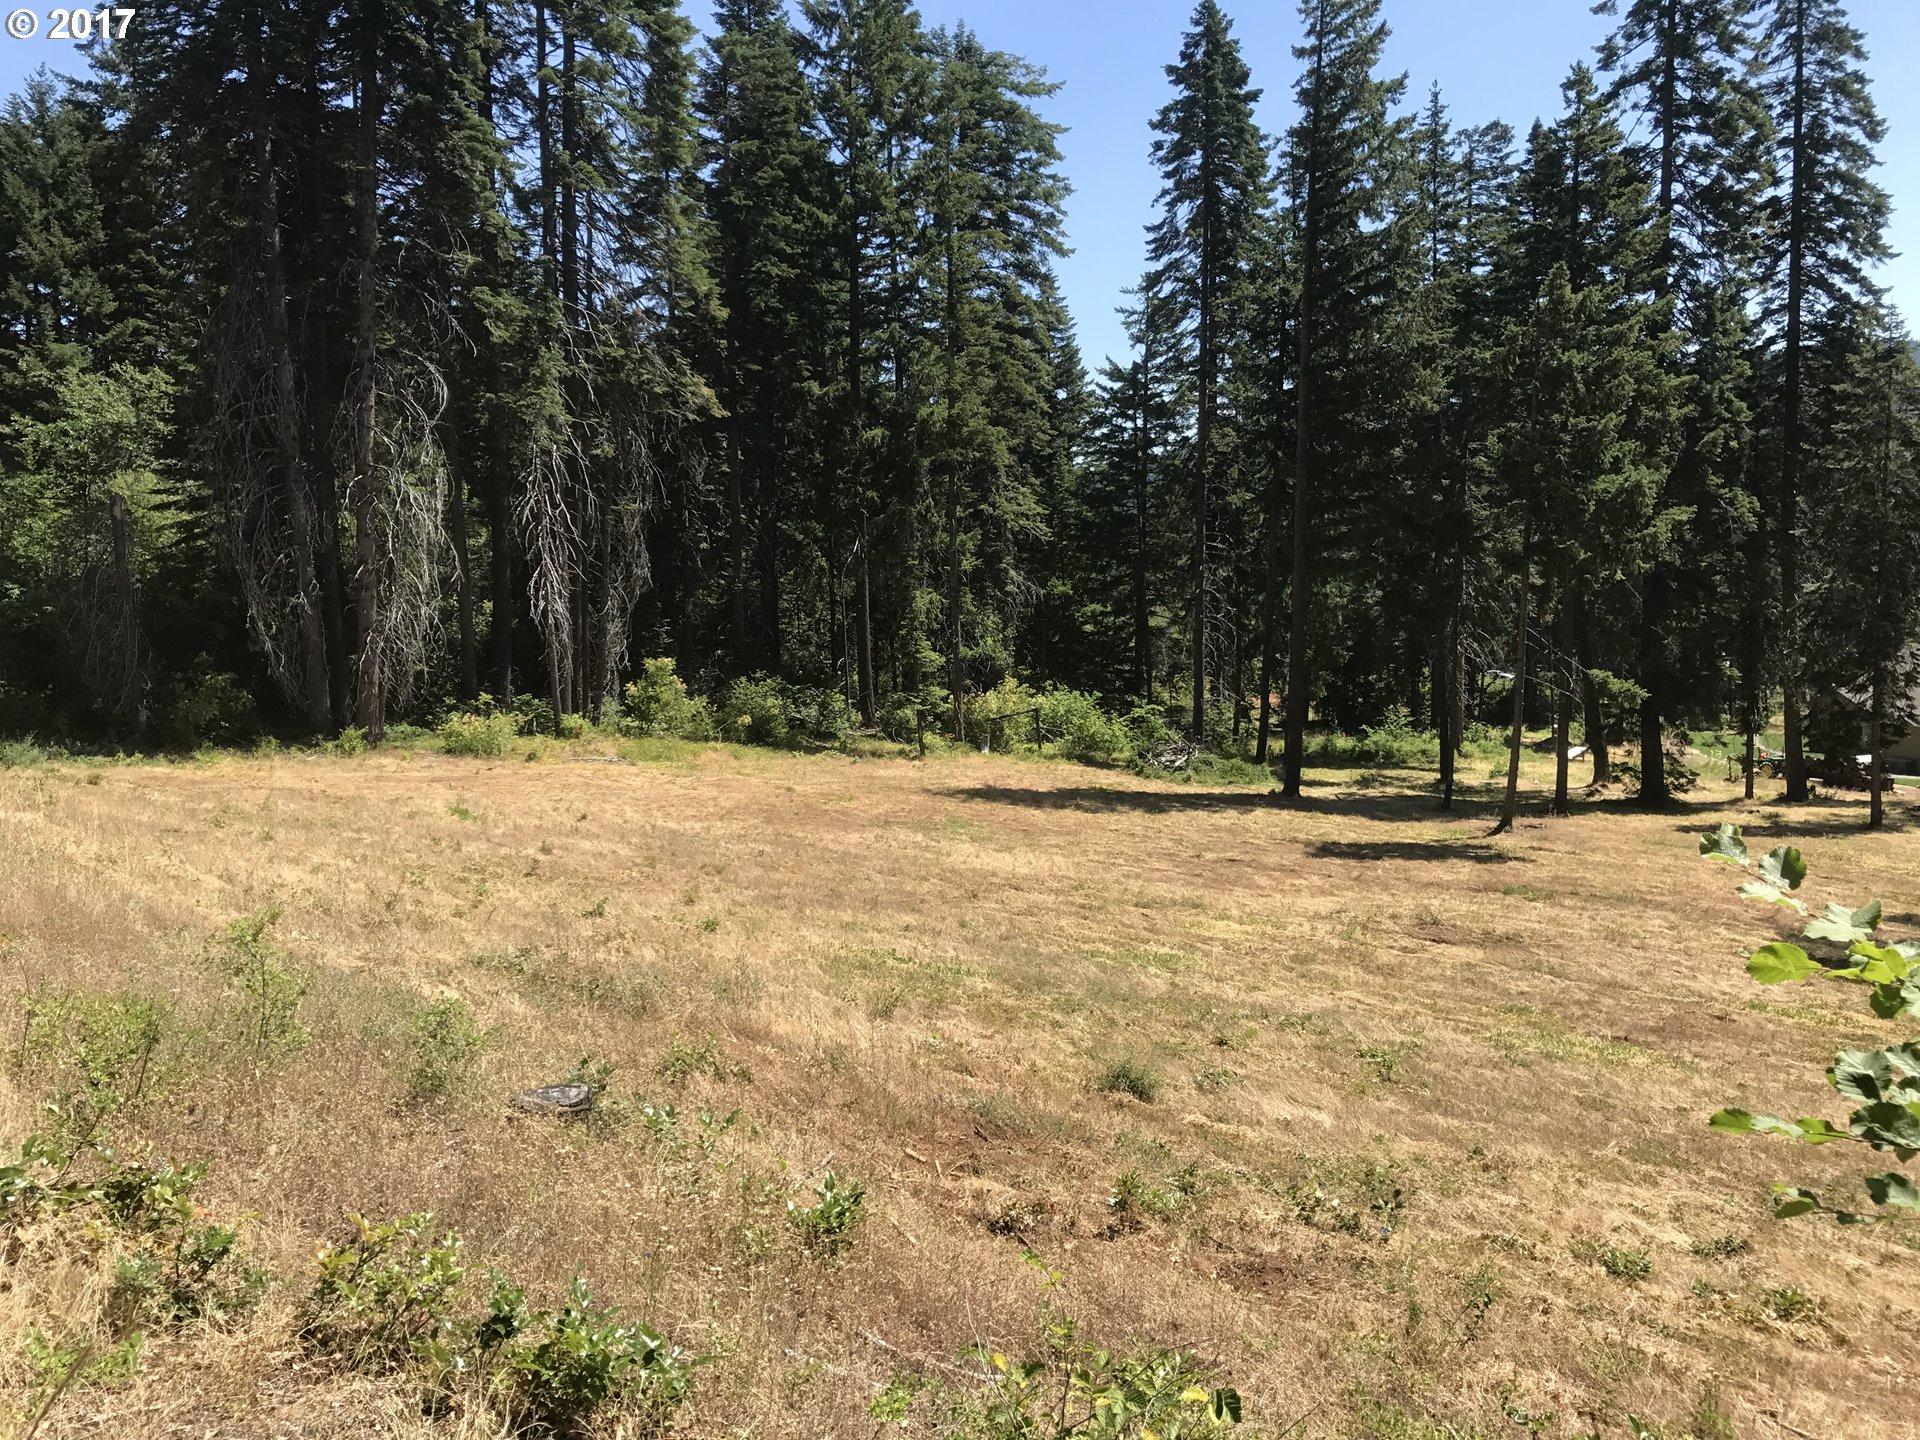 Photo of 4144 NASTASI DR Mt Hood Prkdl, OR 97041